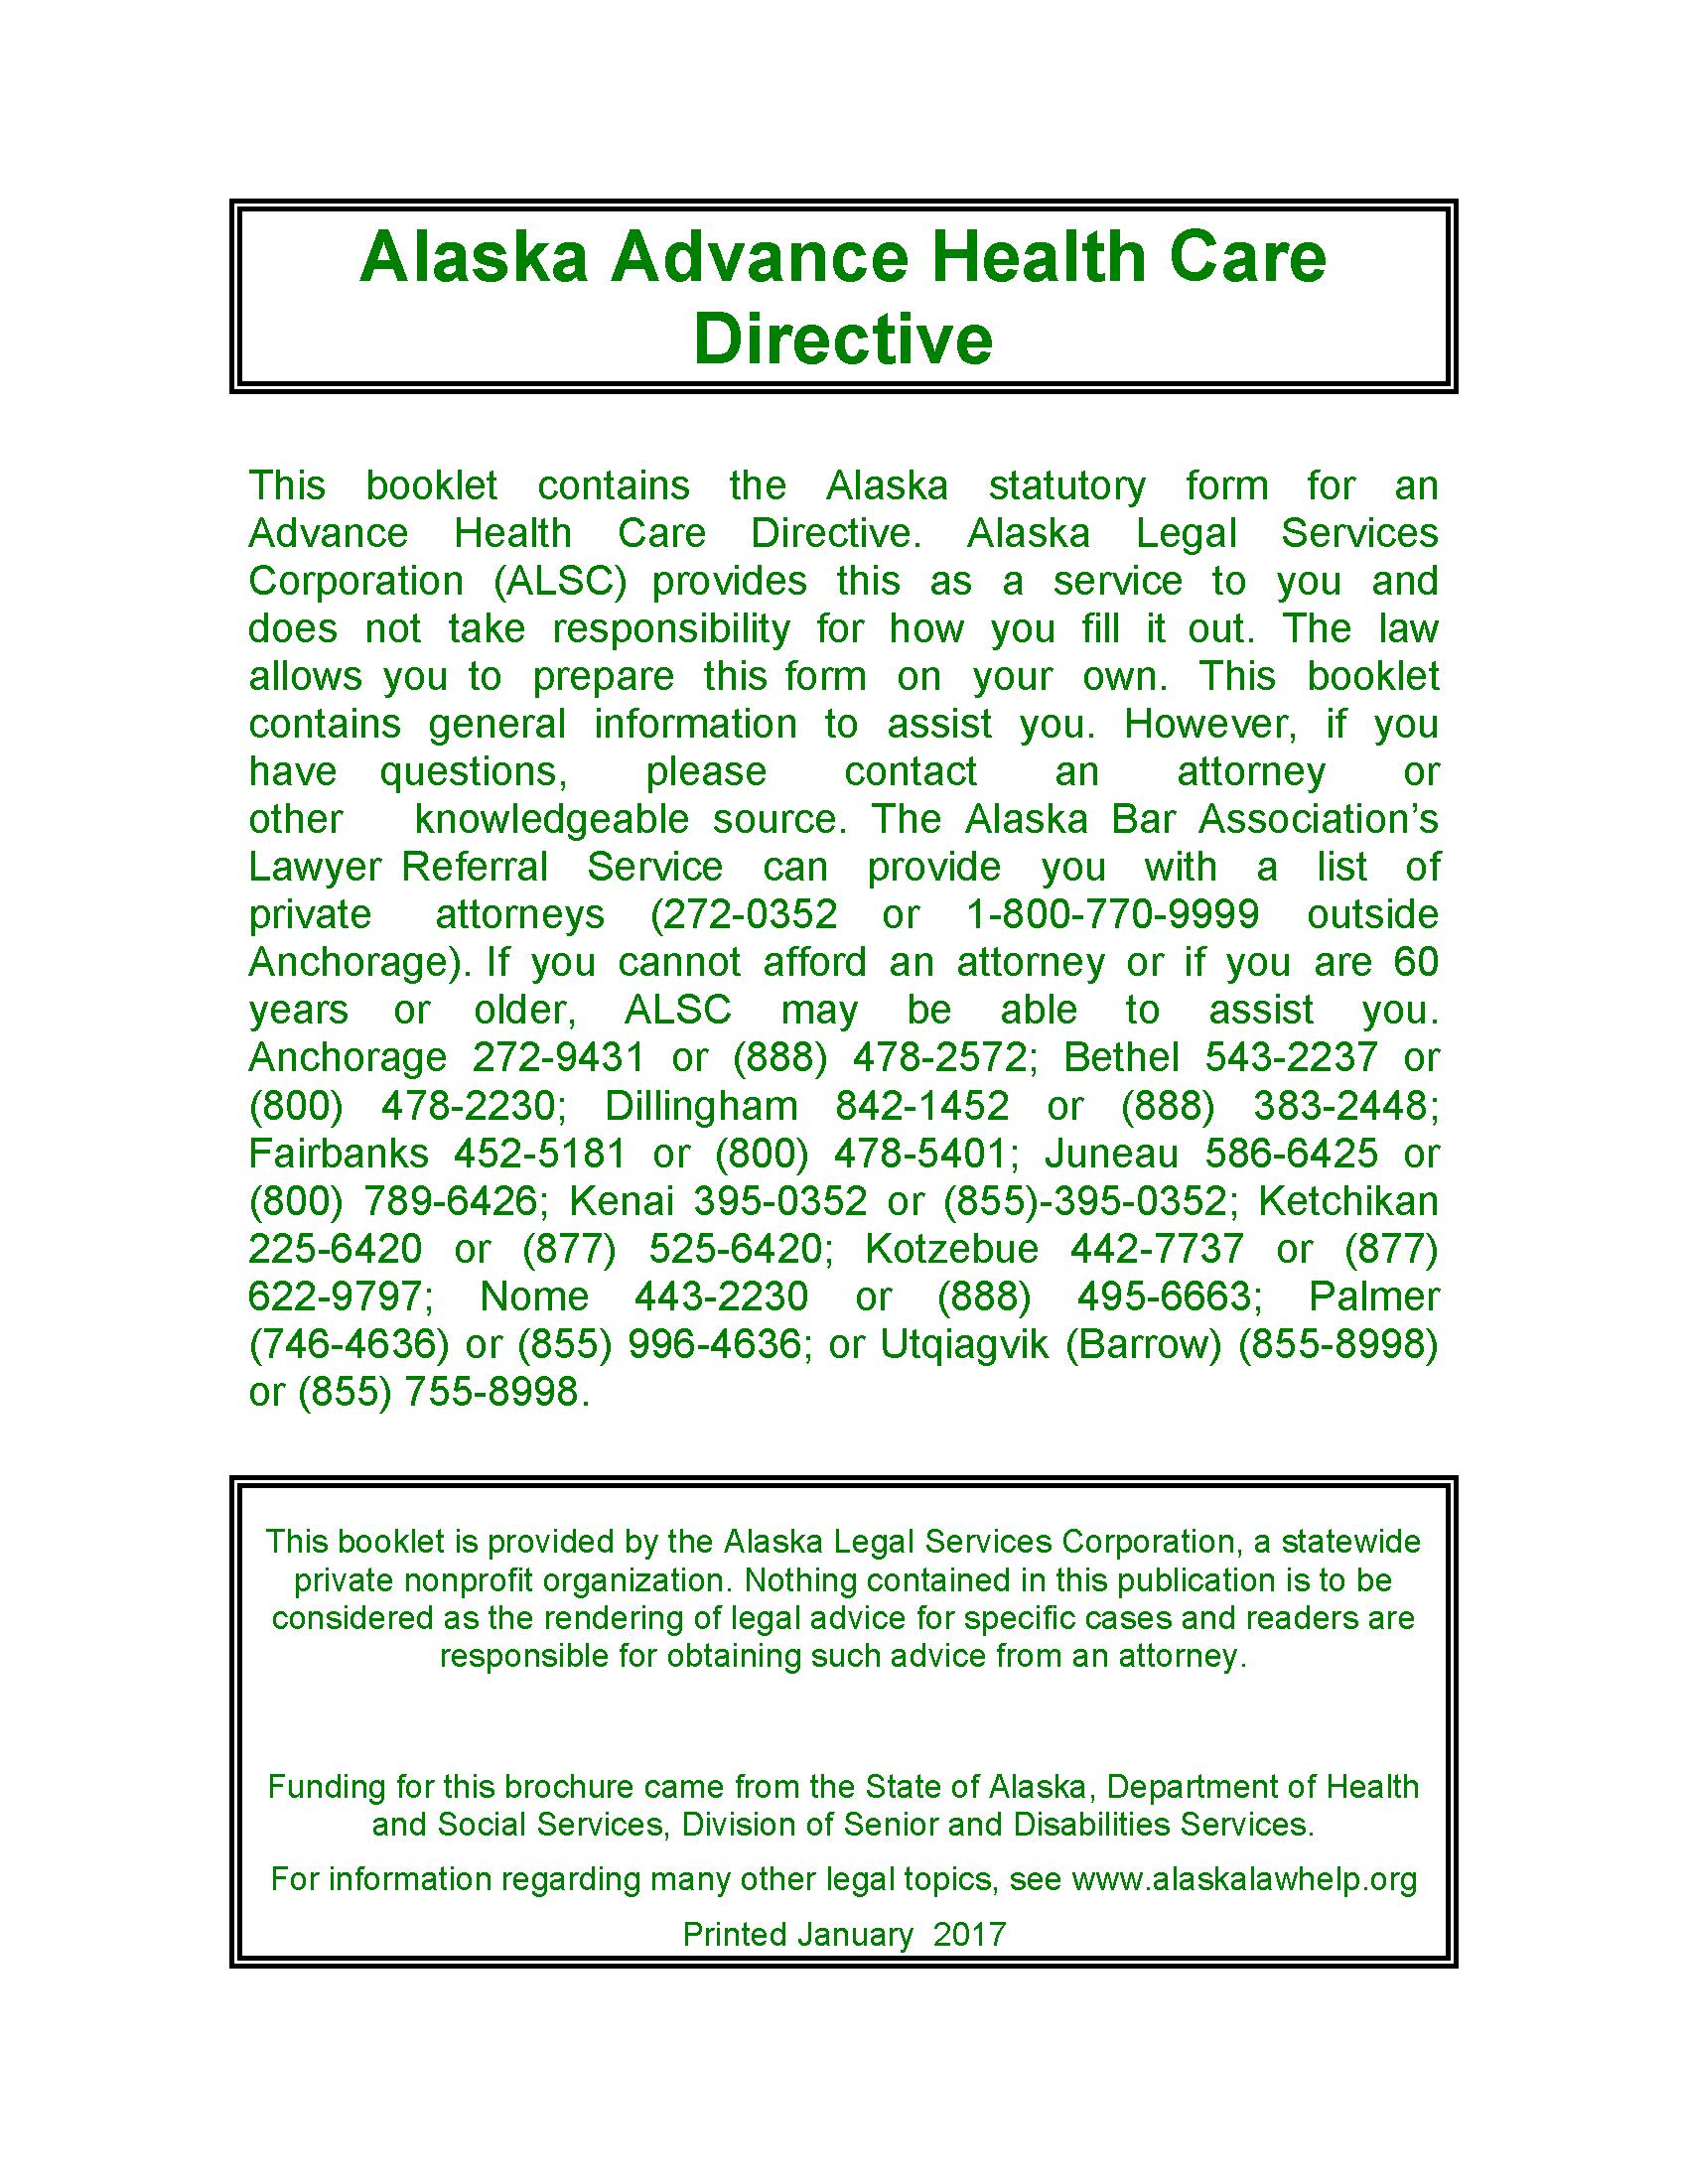 Alaska Advance Directive For Health Care